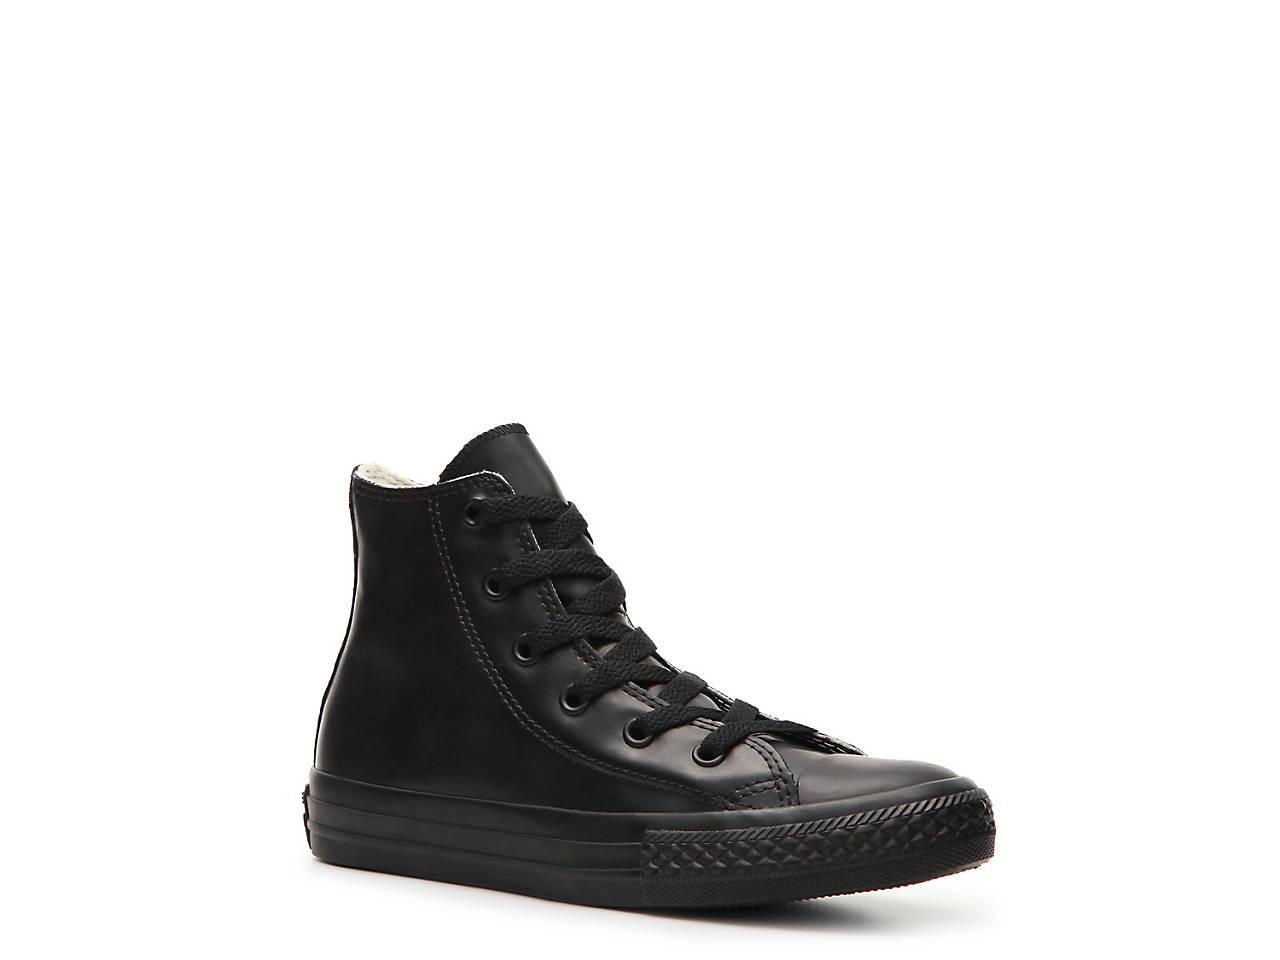 Converse Infant Chuck Taylor All Star High Street Hi Fashion Sneaker Shoe, Black, 10